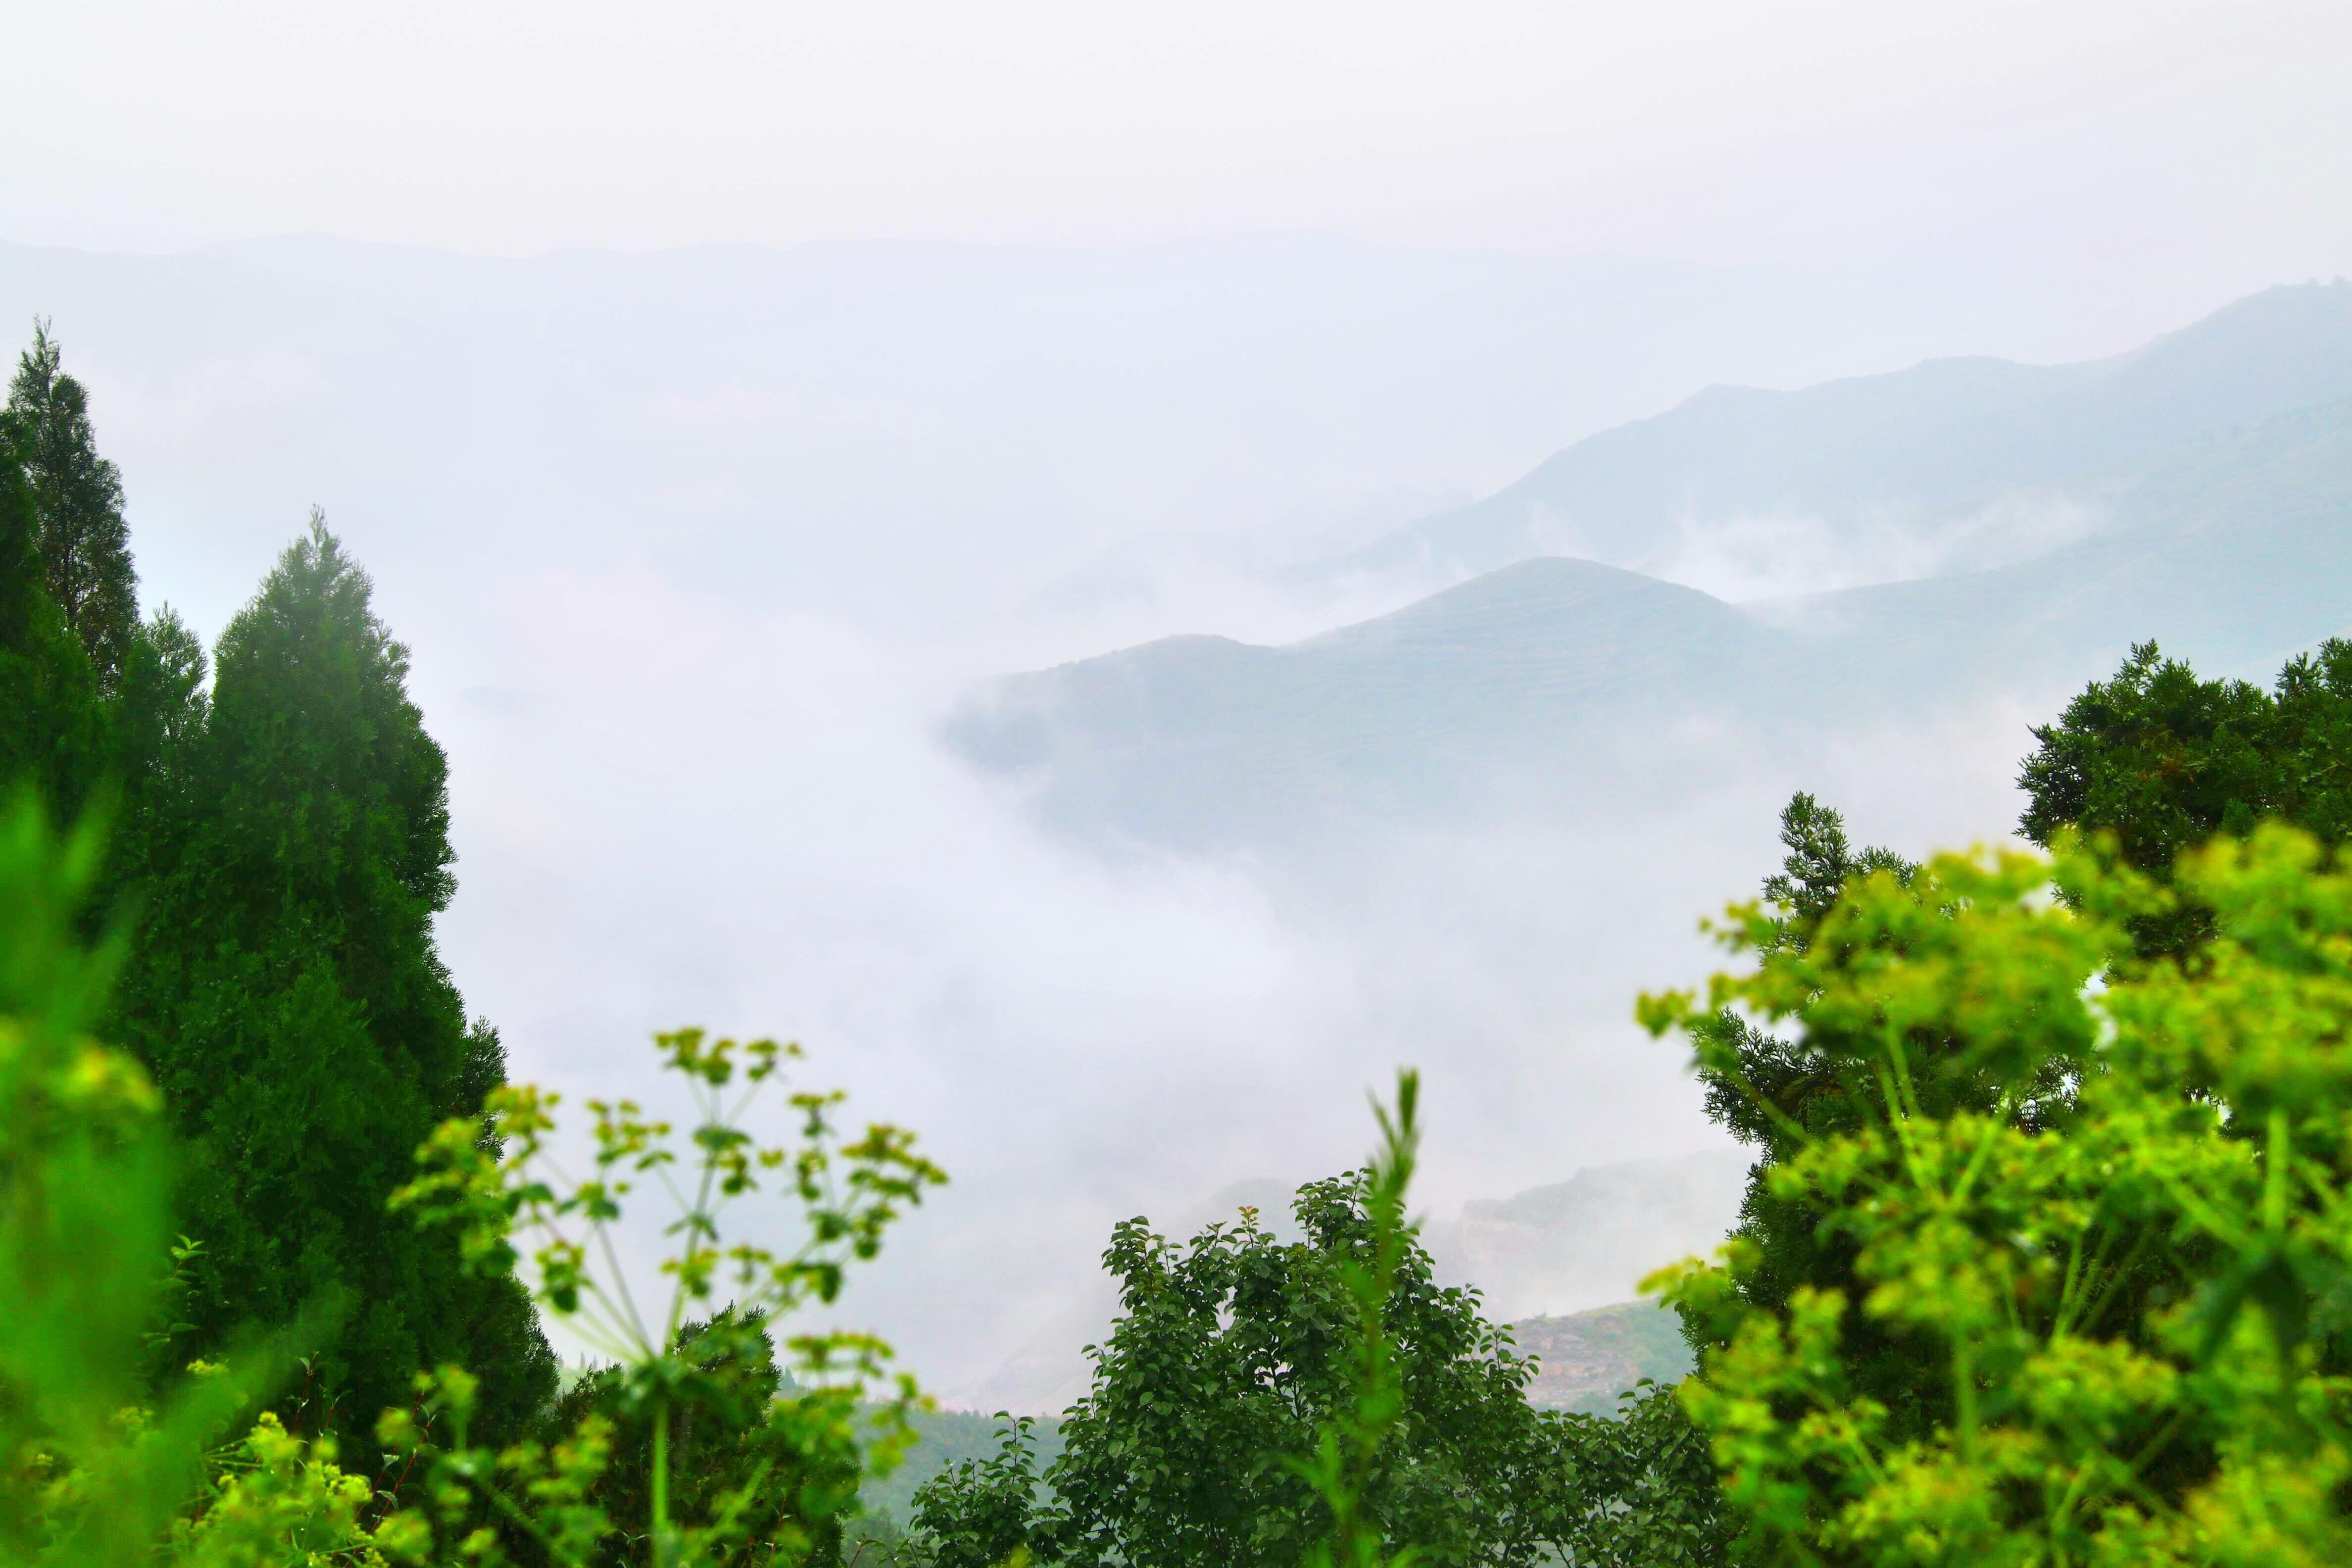 Jinsu Mountain Forest Park